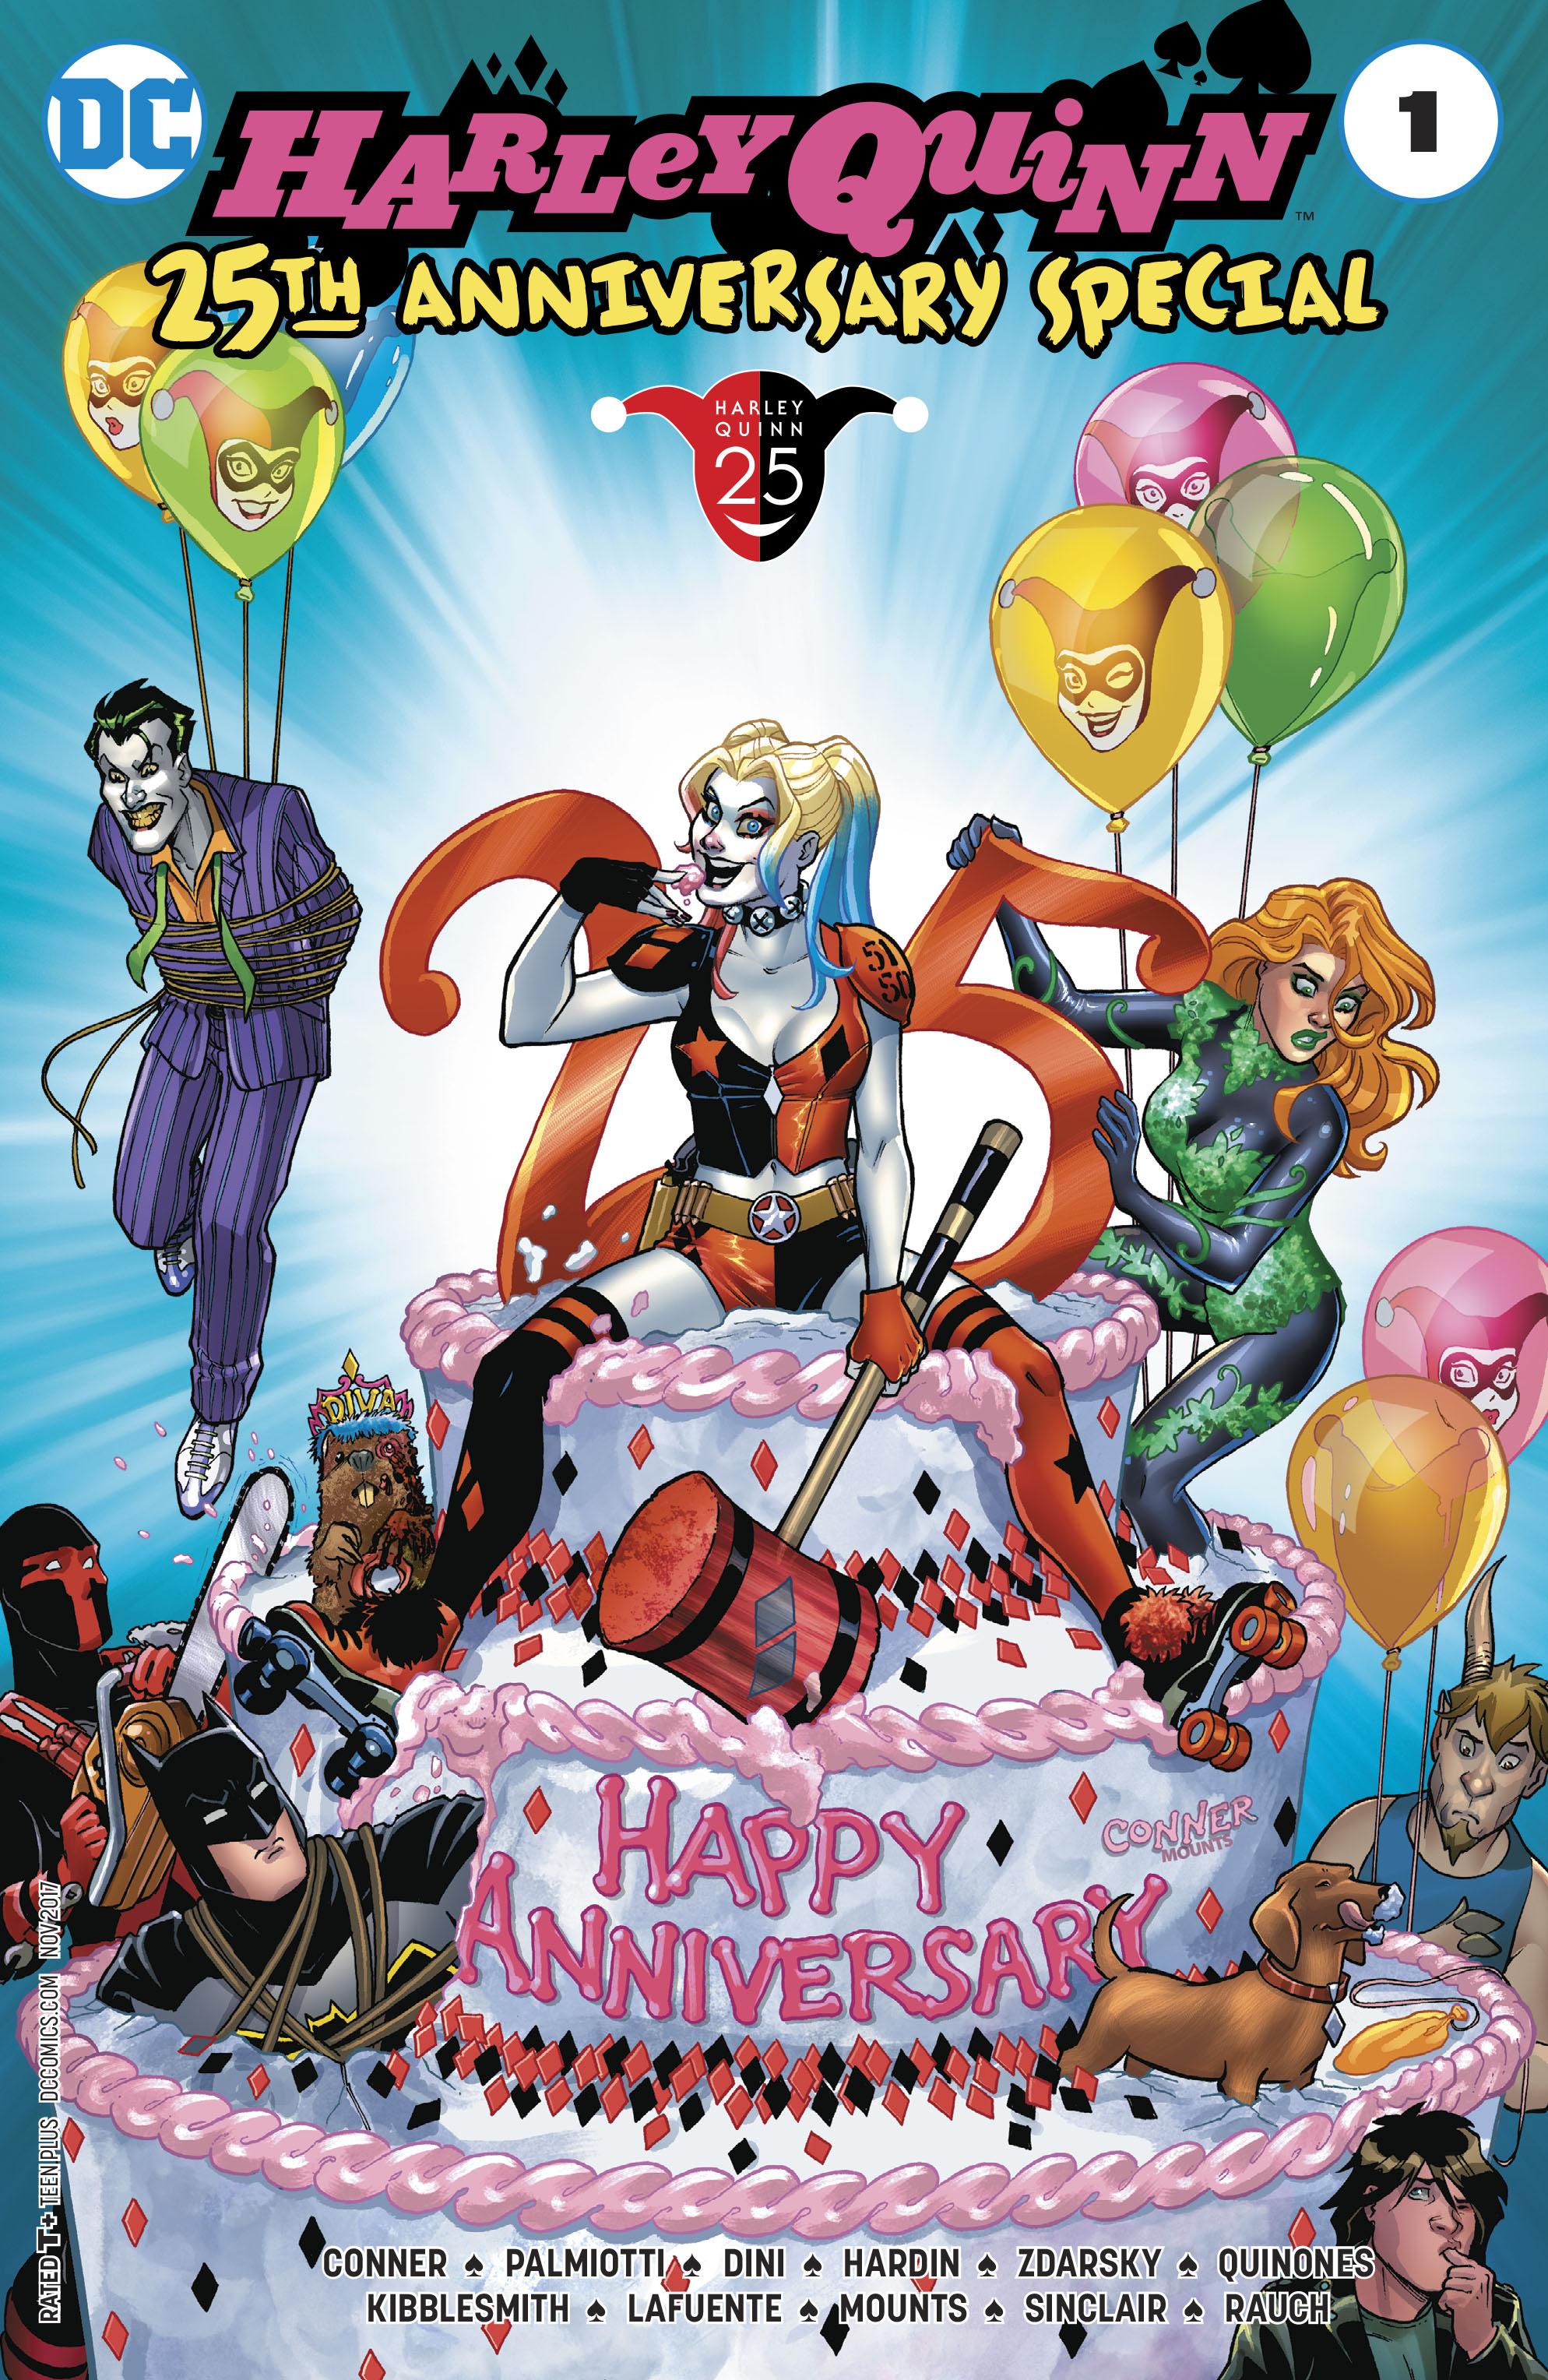 jul170413 harley quinn 25th anniversary special 1 free comic